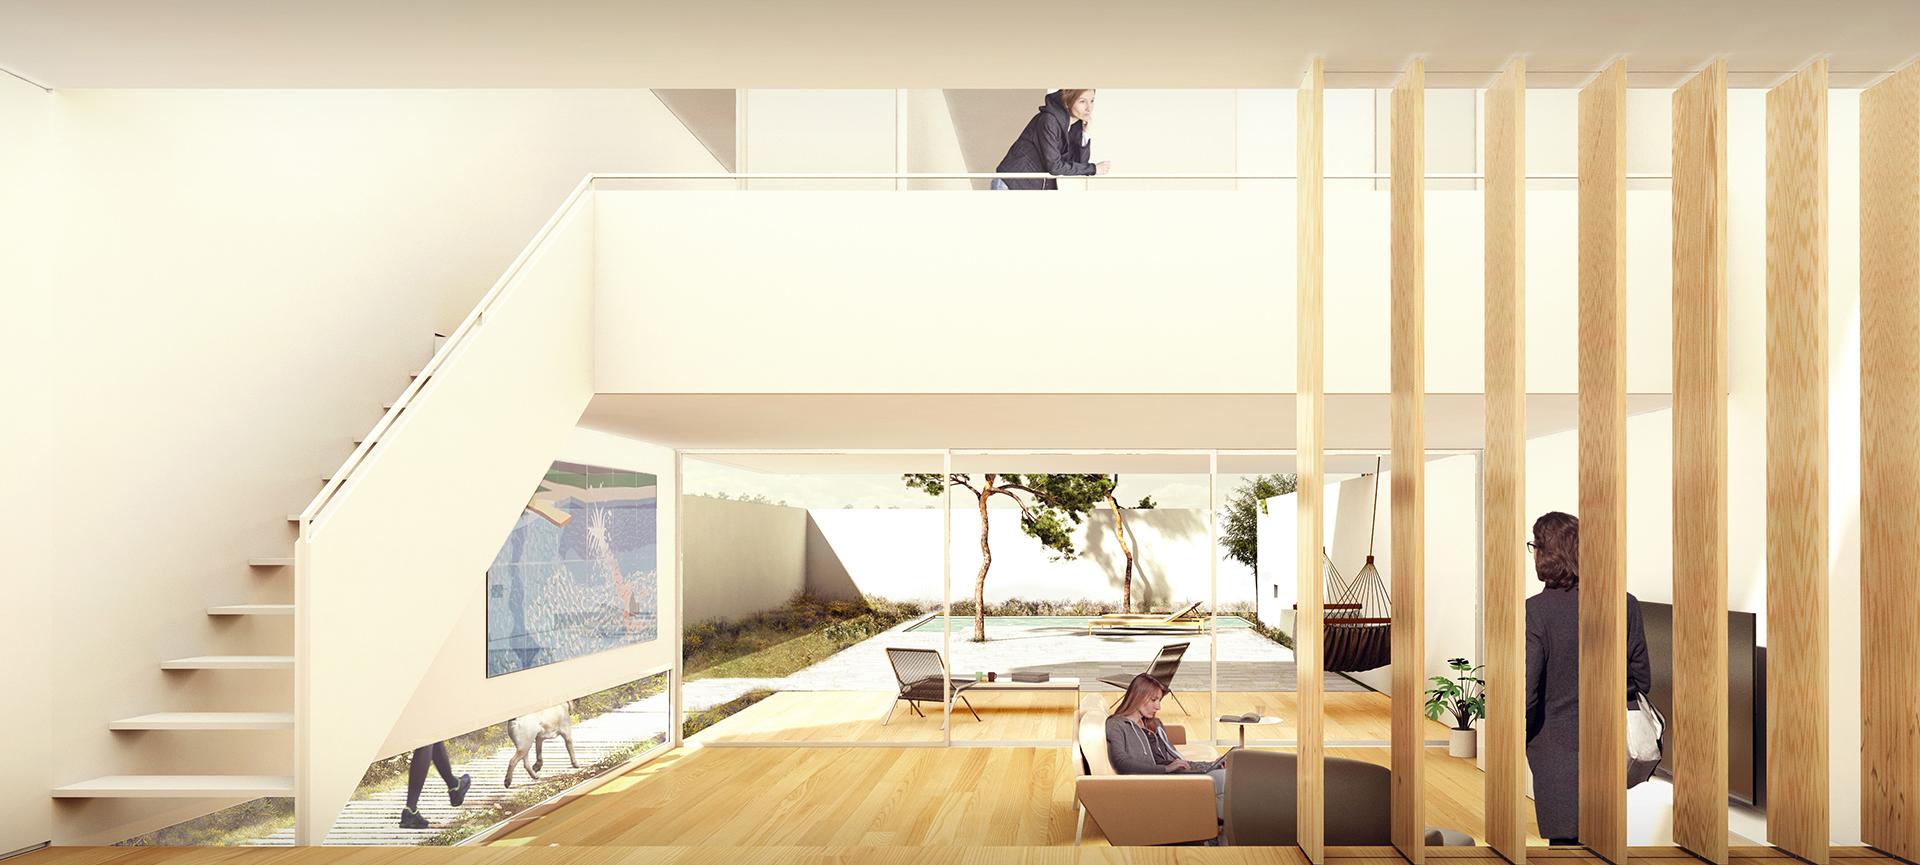 arquitectura-betera